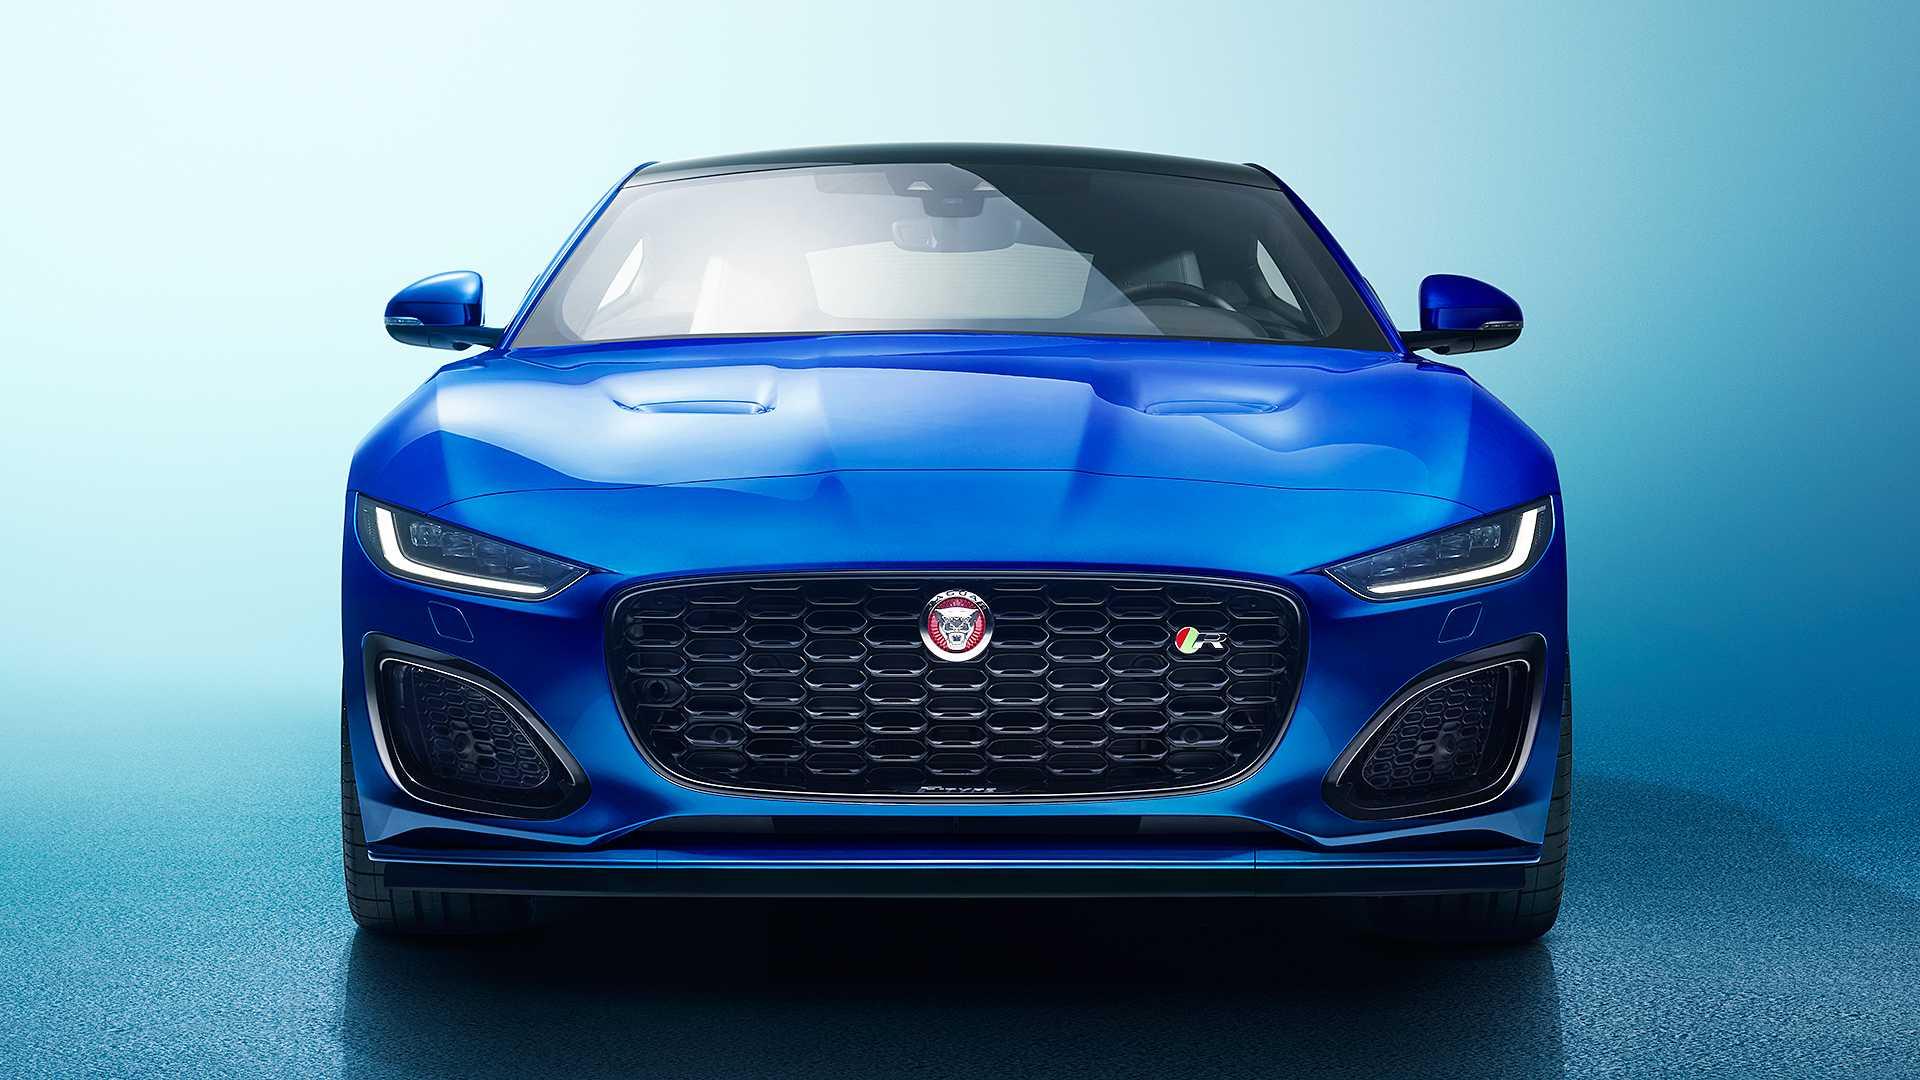 2021-jaguar-f-type-12